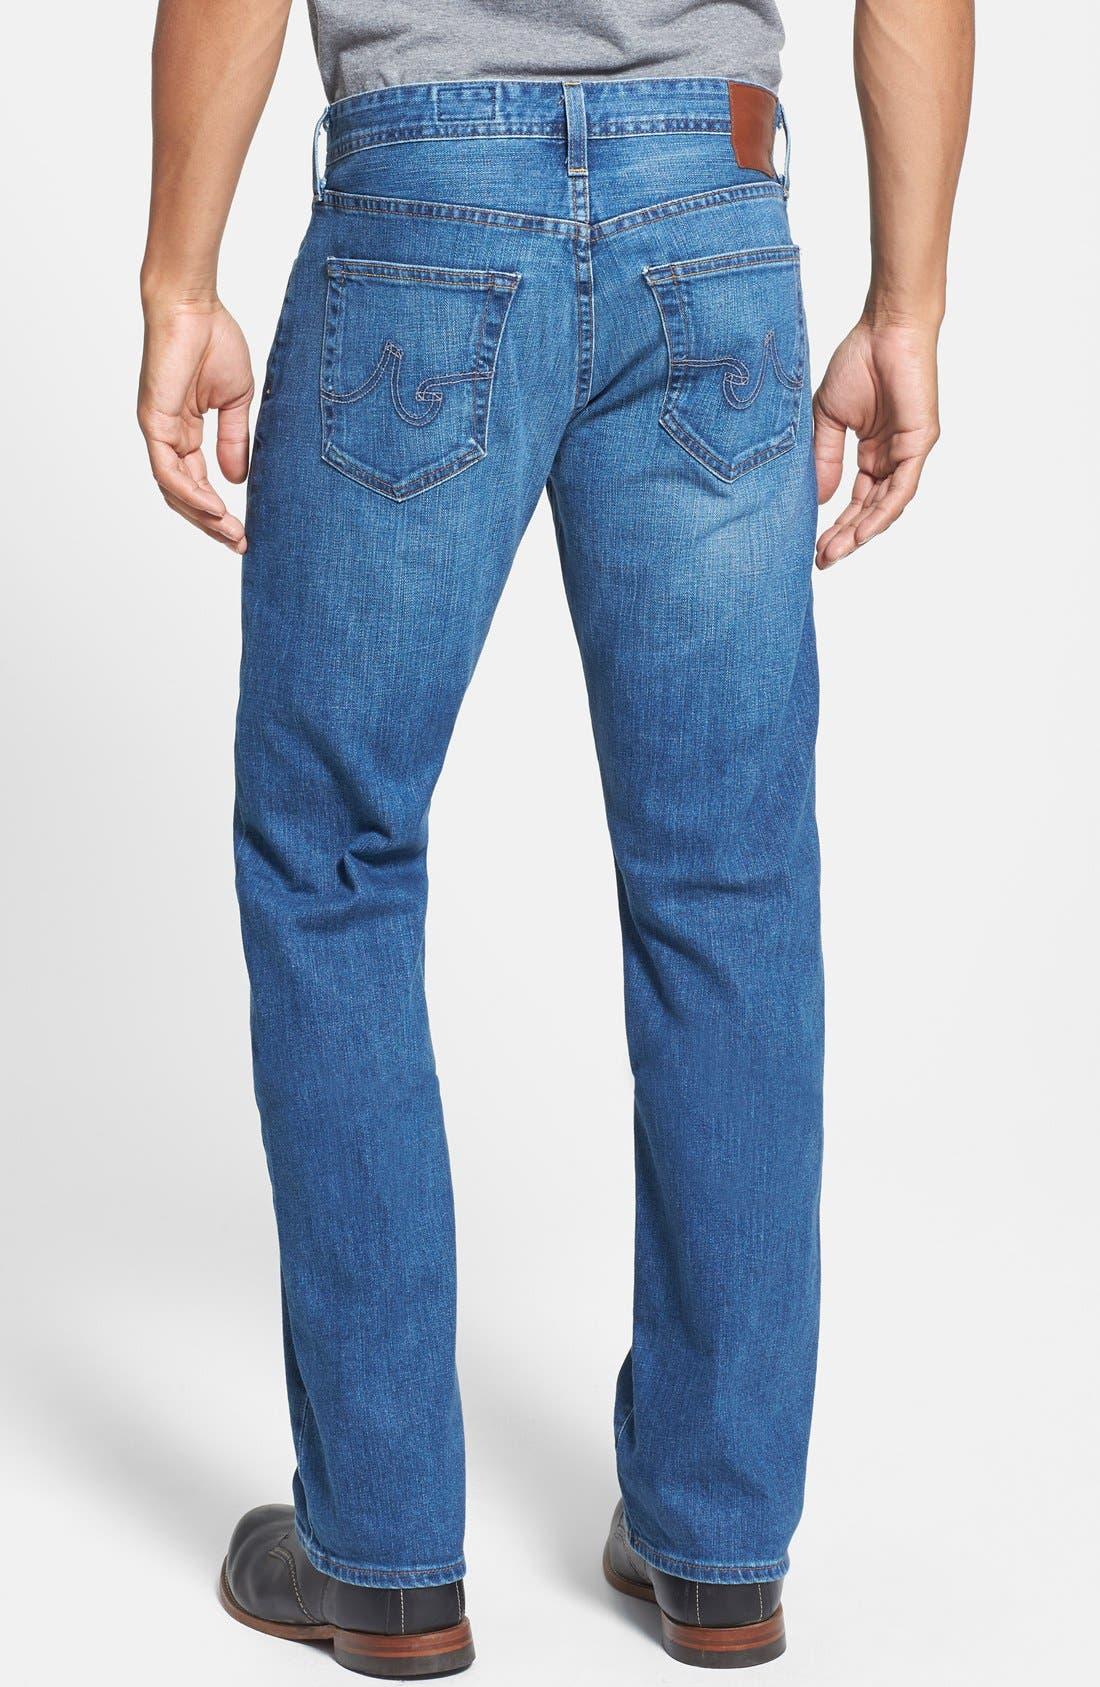 Alternate Image 2  - AG Jeans 'Protégé' Straight Leg Jeans (Eleven Year Wildcraft)